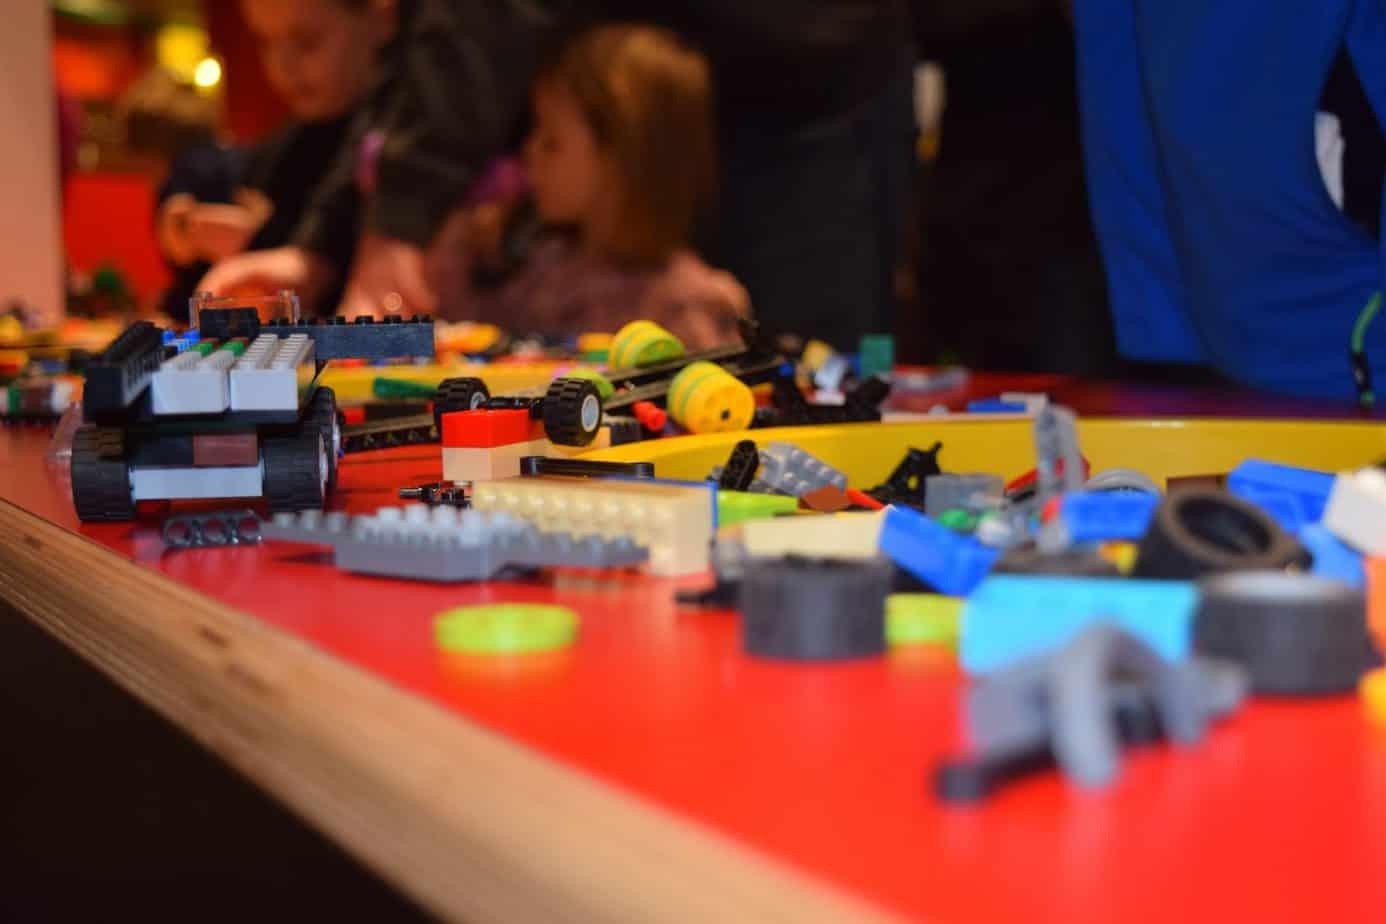 Lego closeup